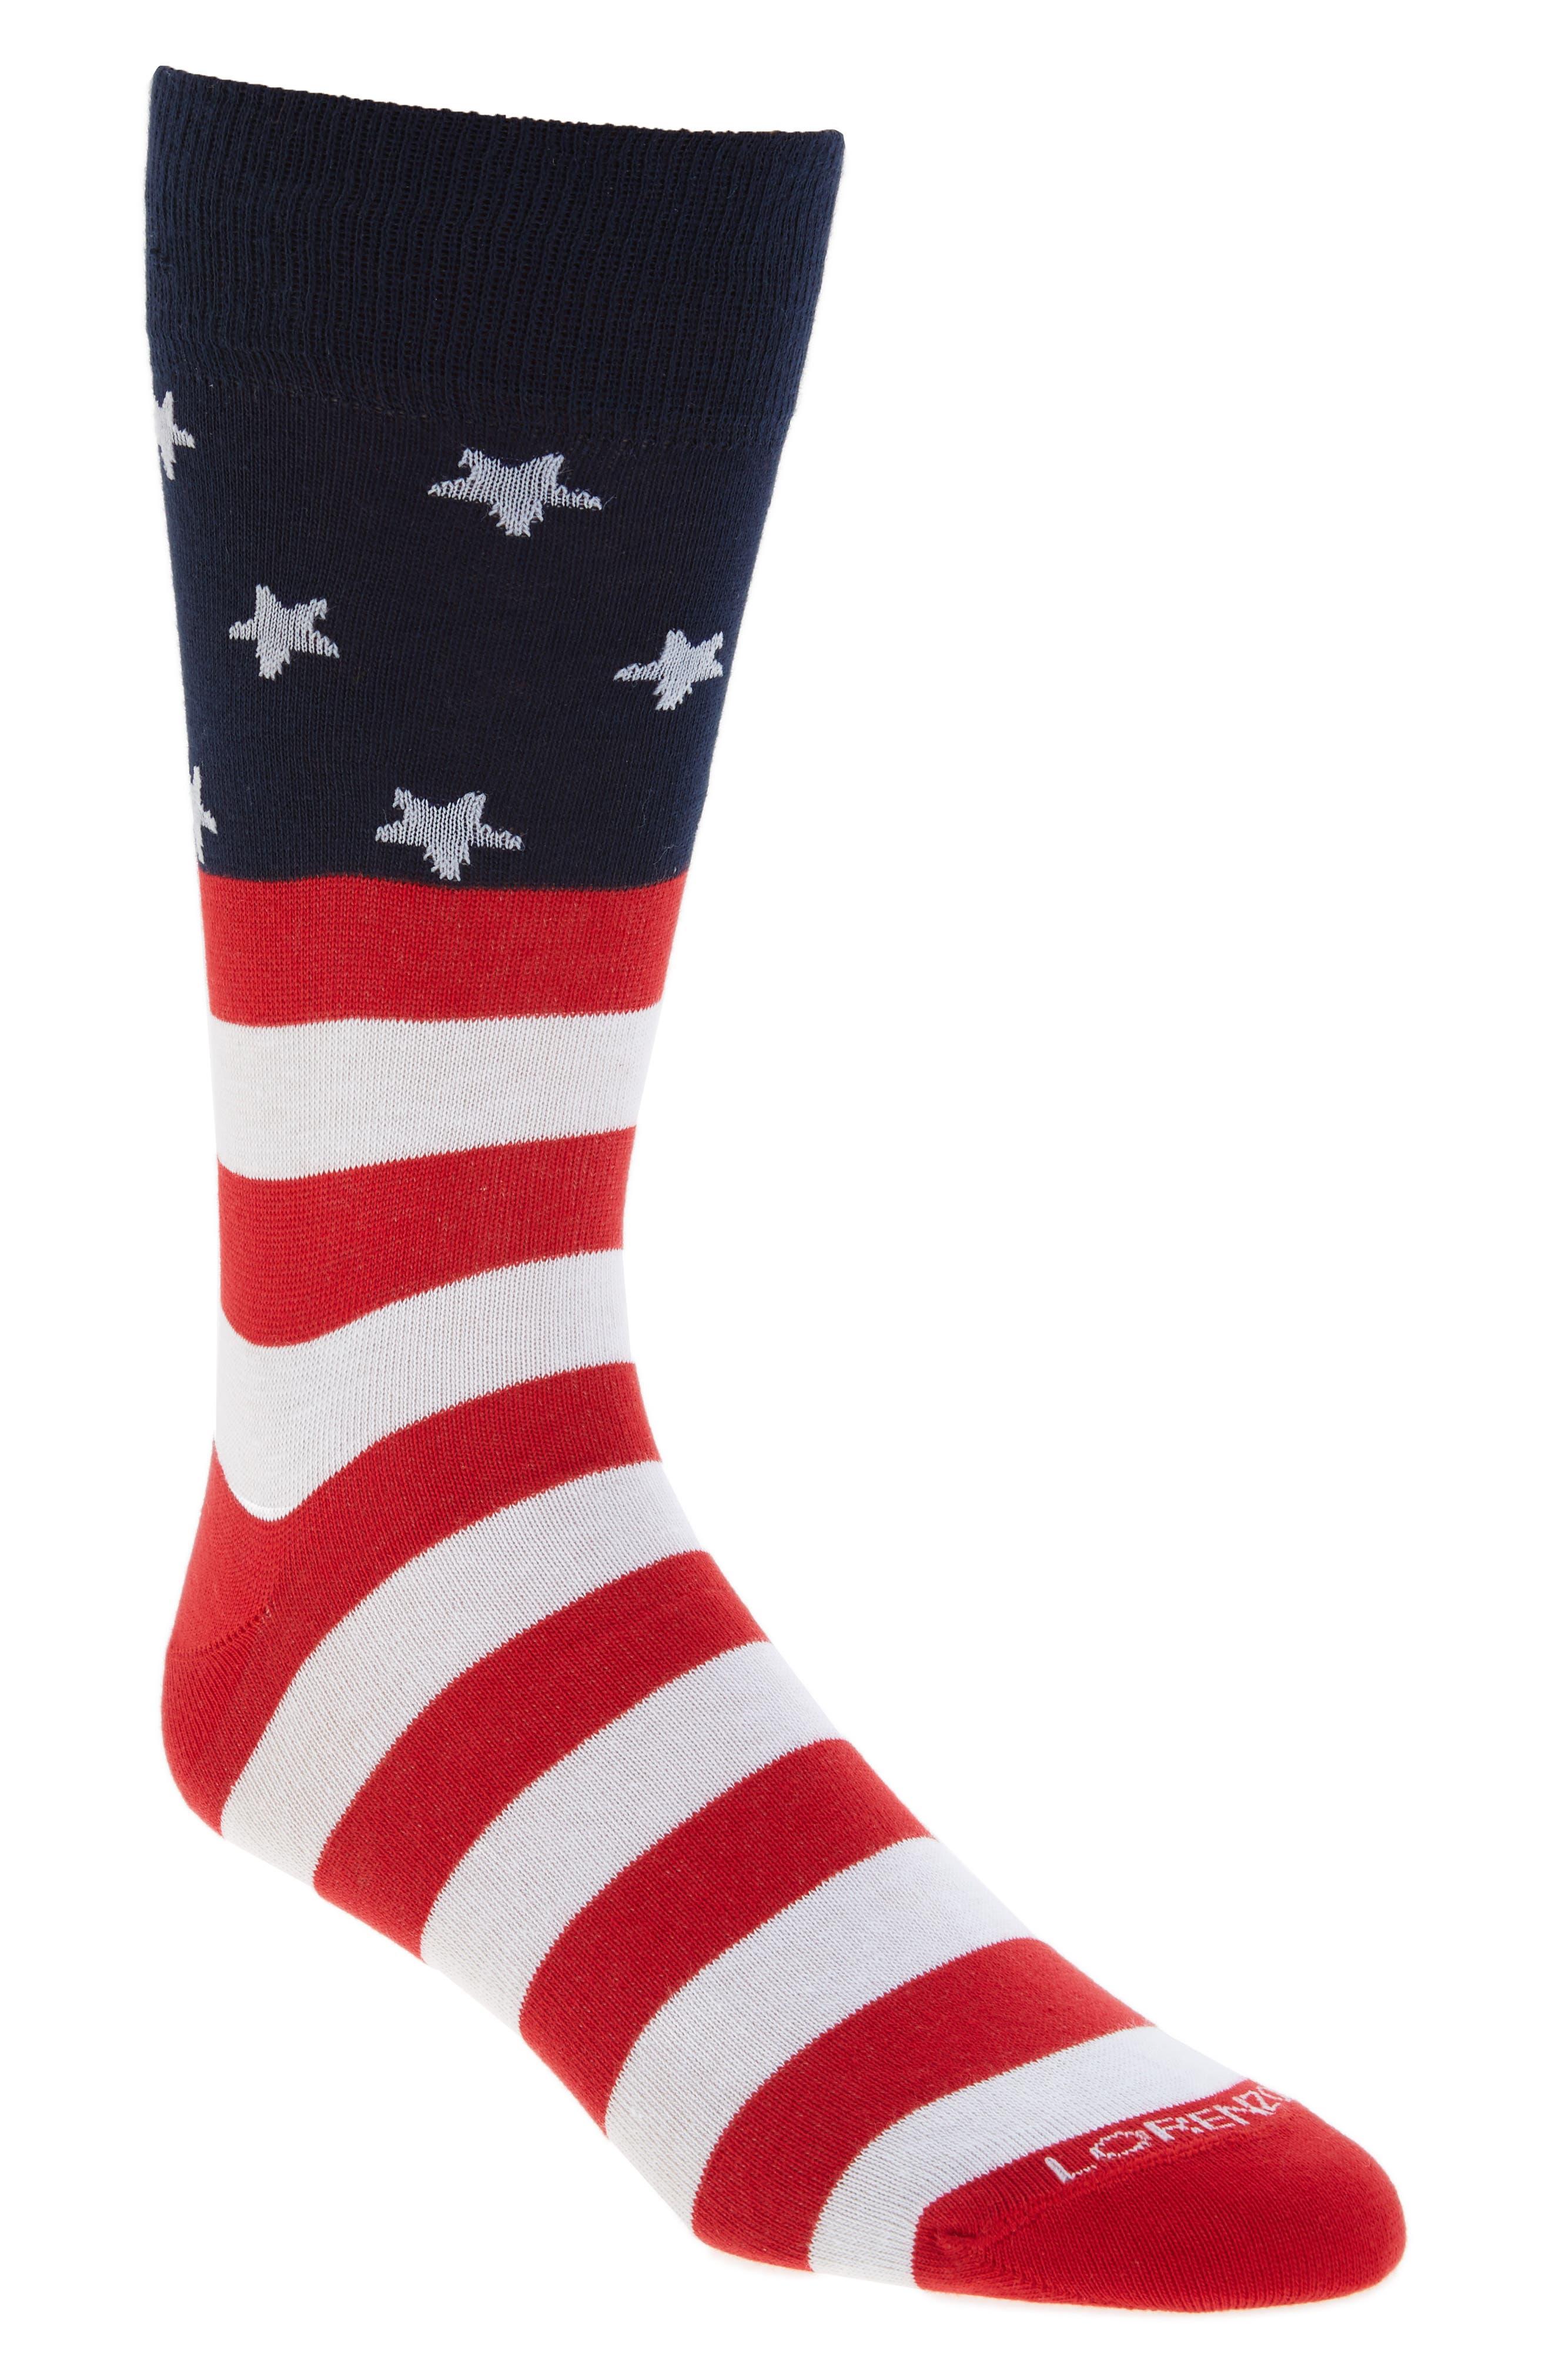 Americana Crew Socks,                             Main thumbnail 1, color,                             600